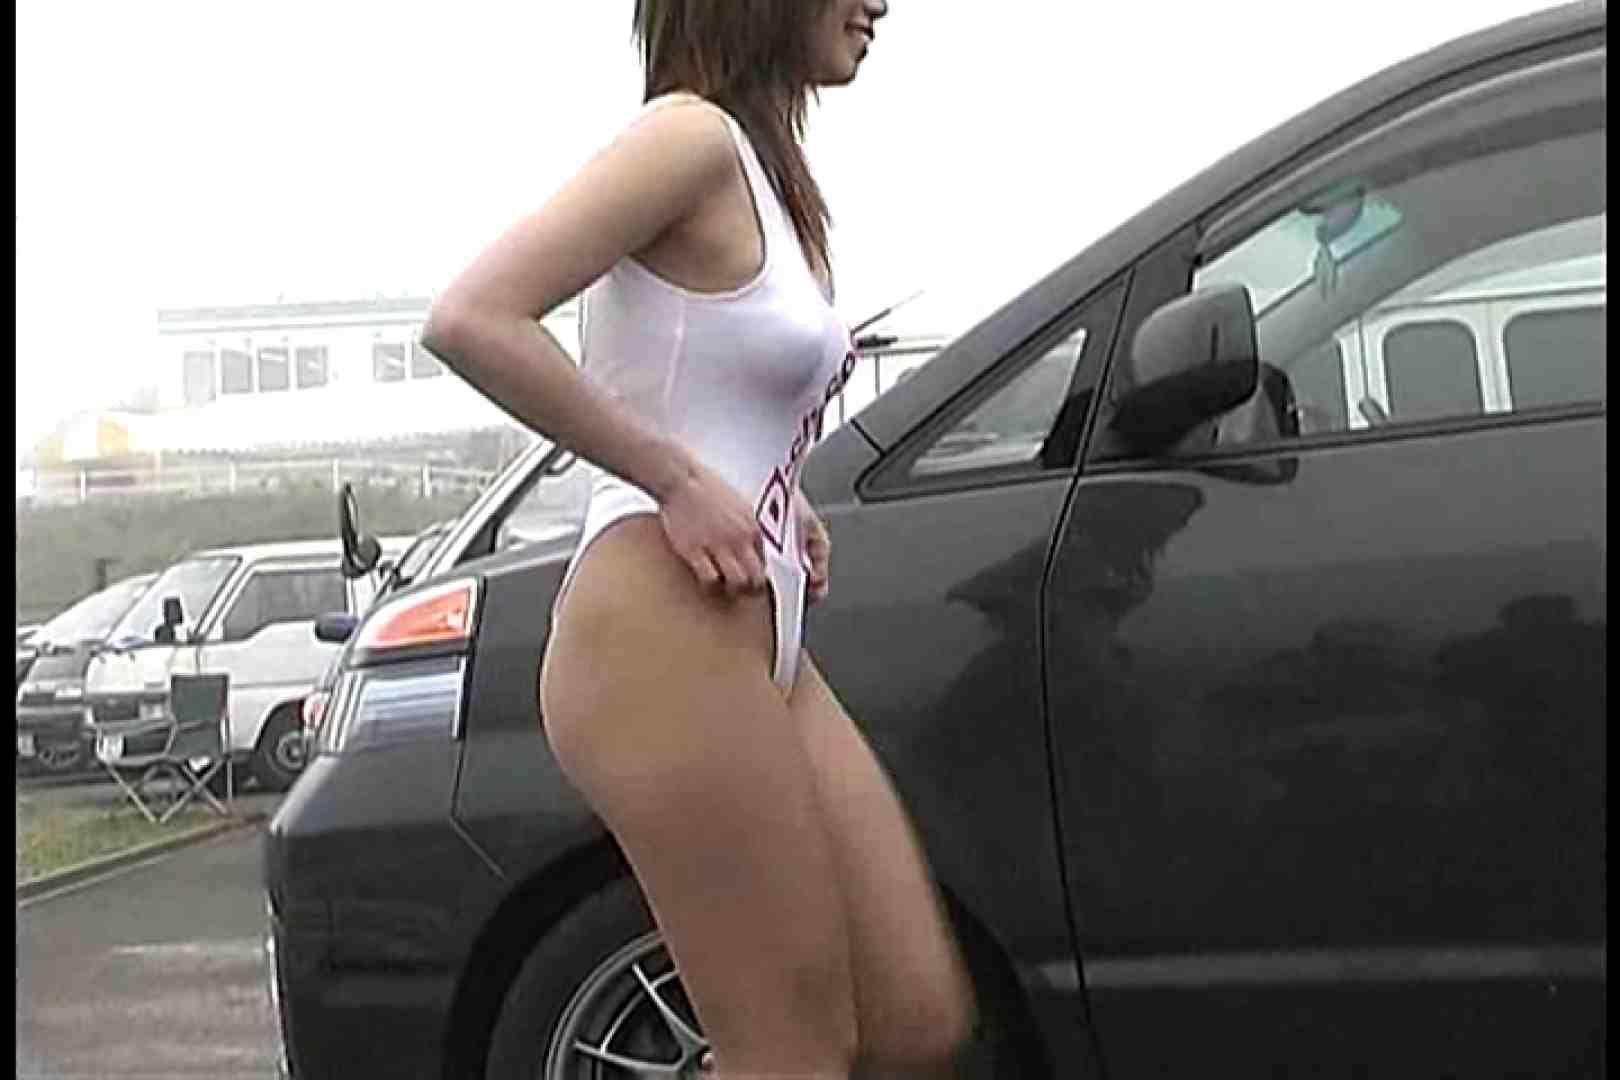 RQカメラ地獄Vol.3 OLセックス 隠し撮りオマンコ動画紹介 64画像 47